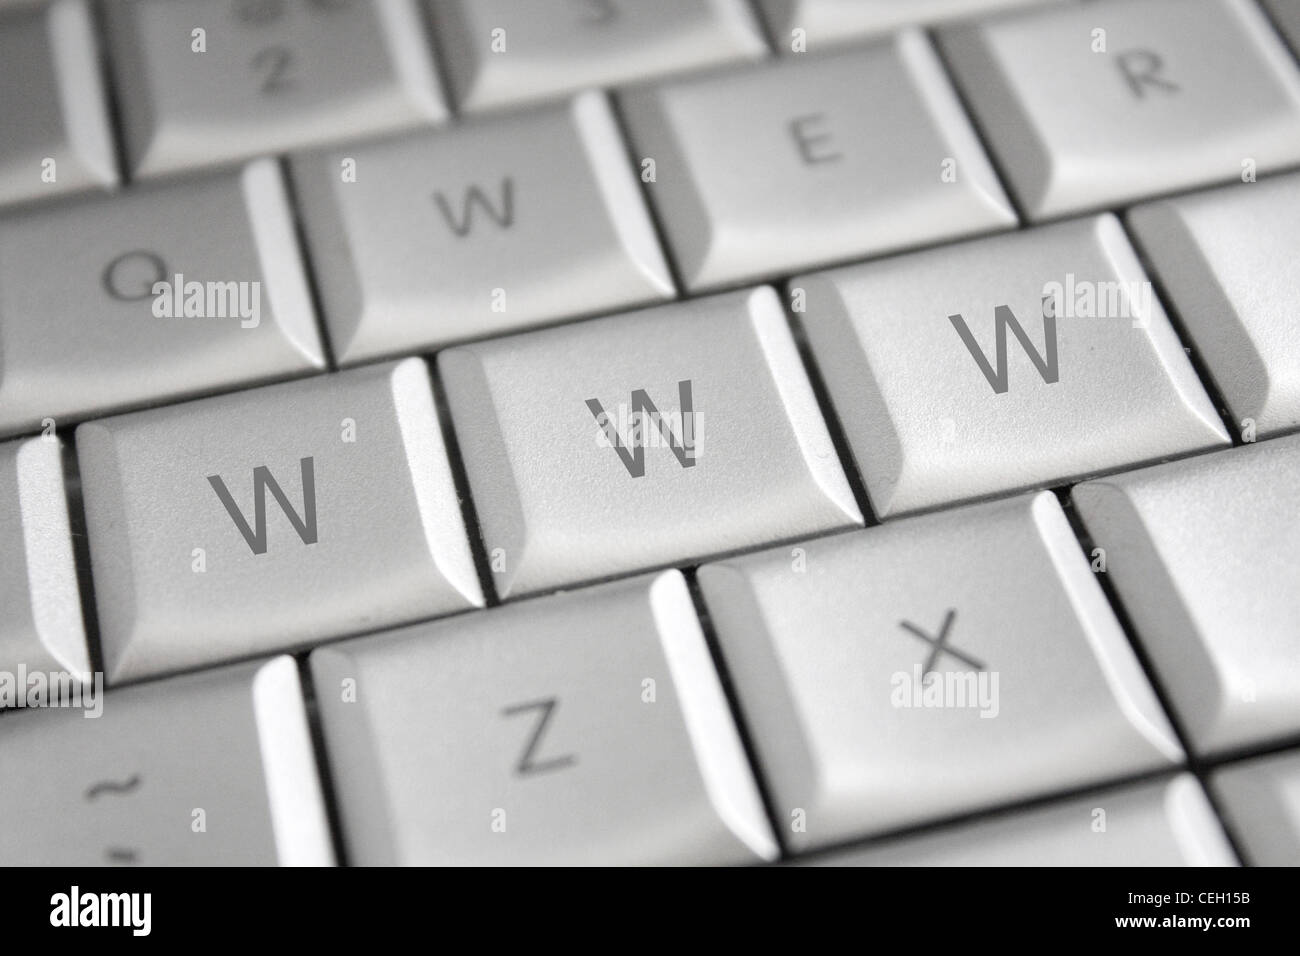 www - Stock Image